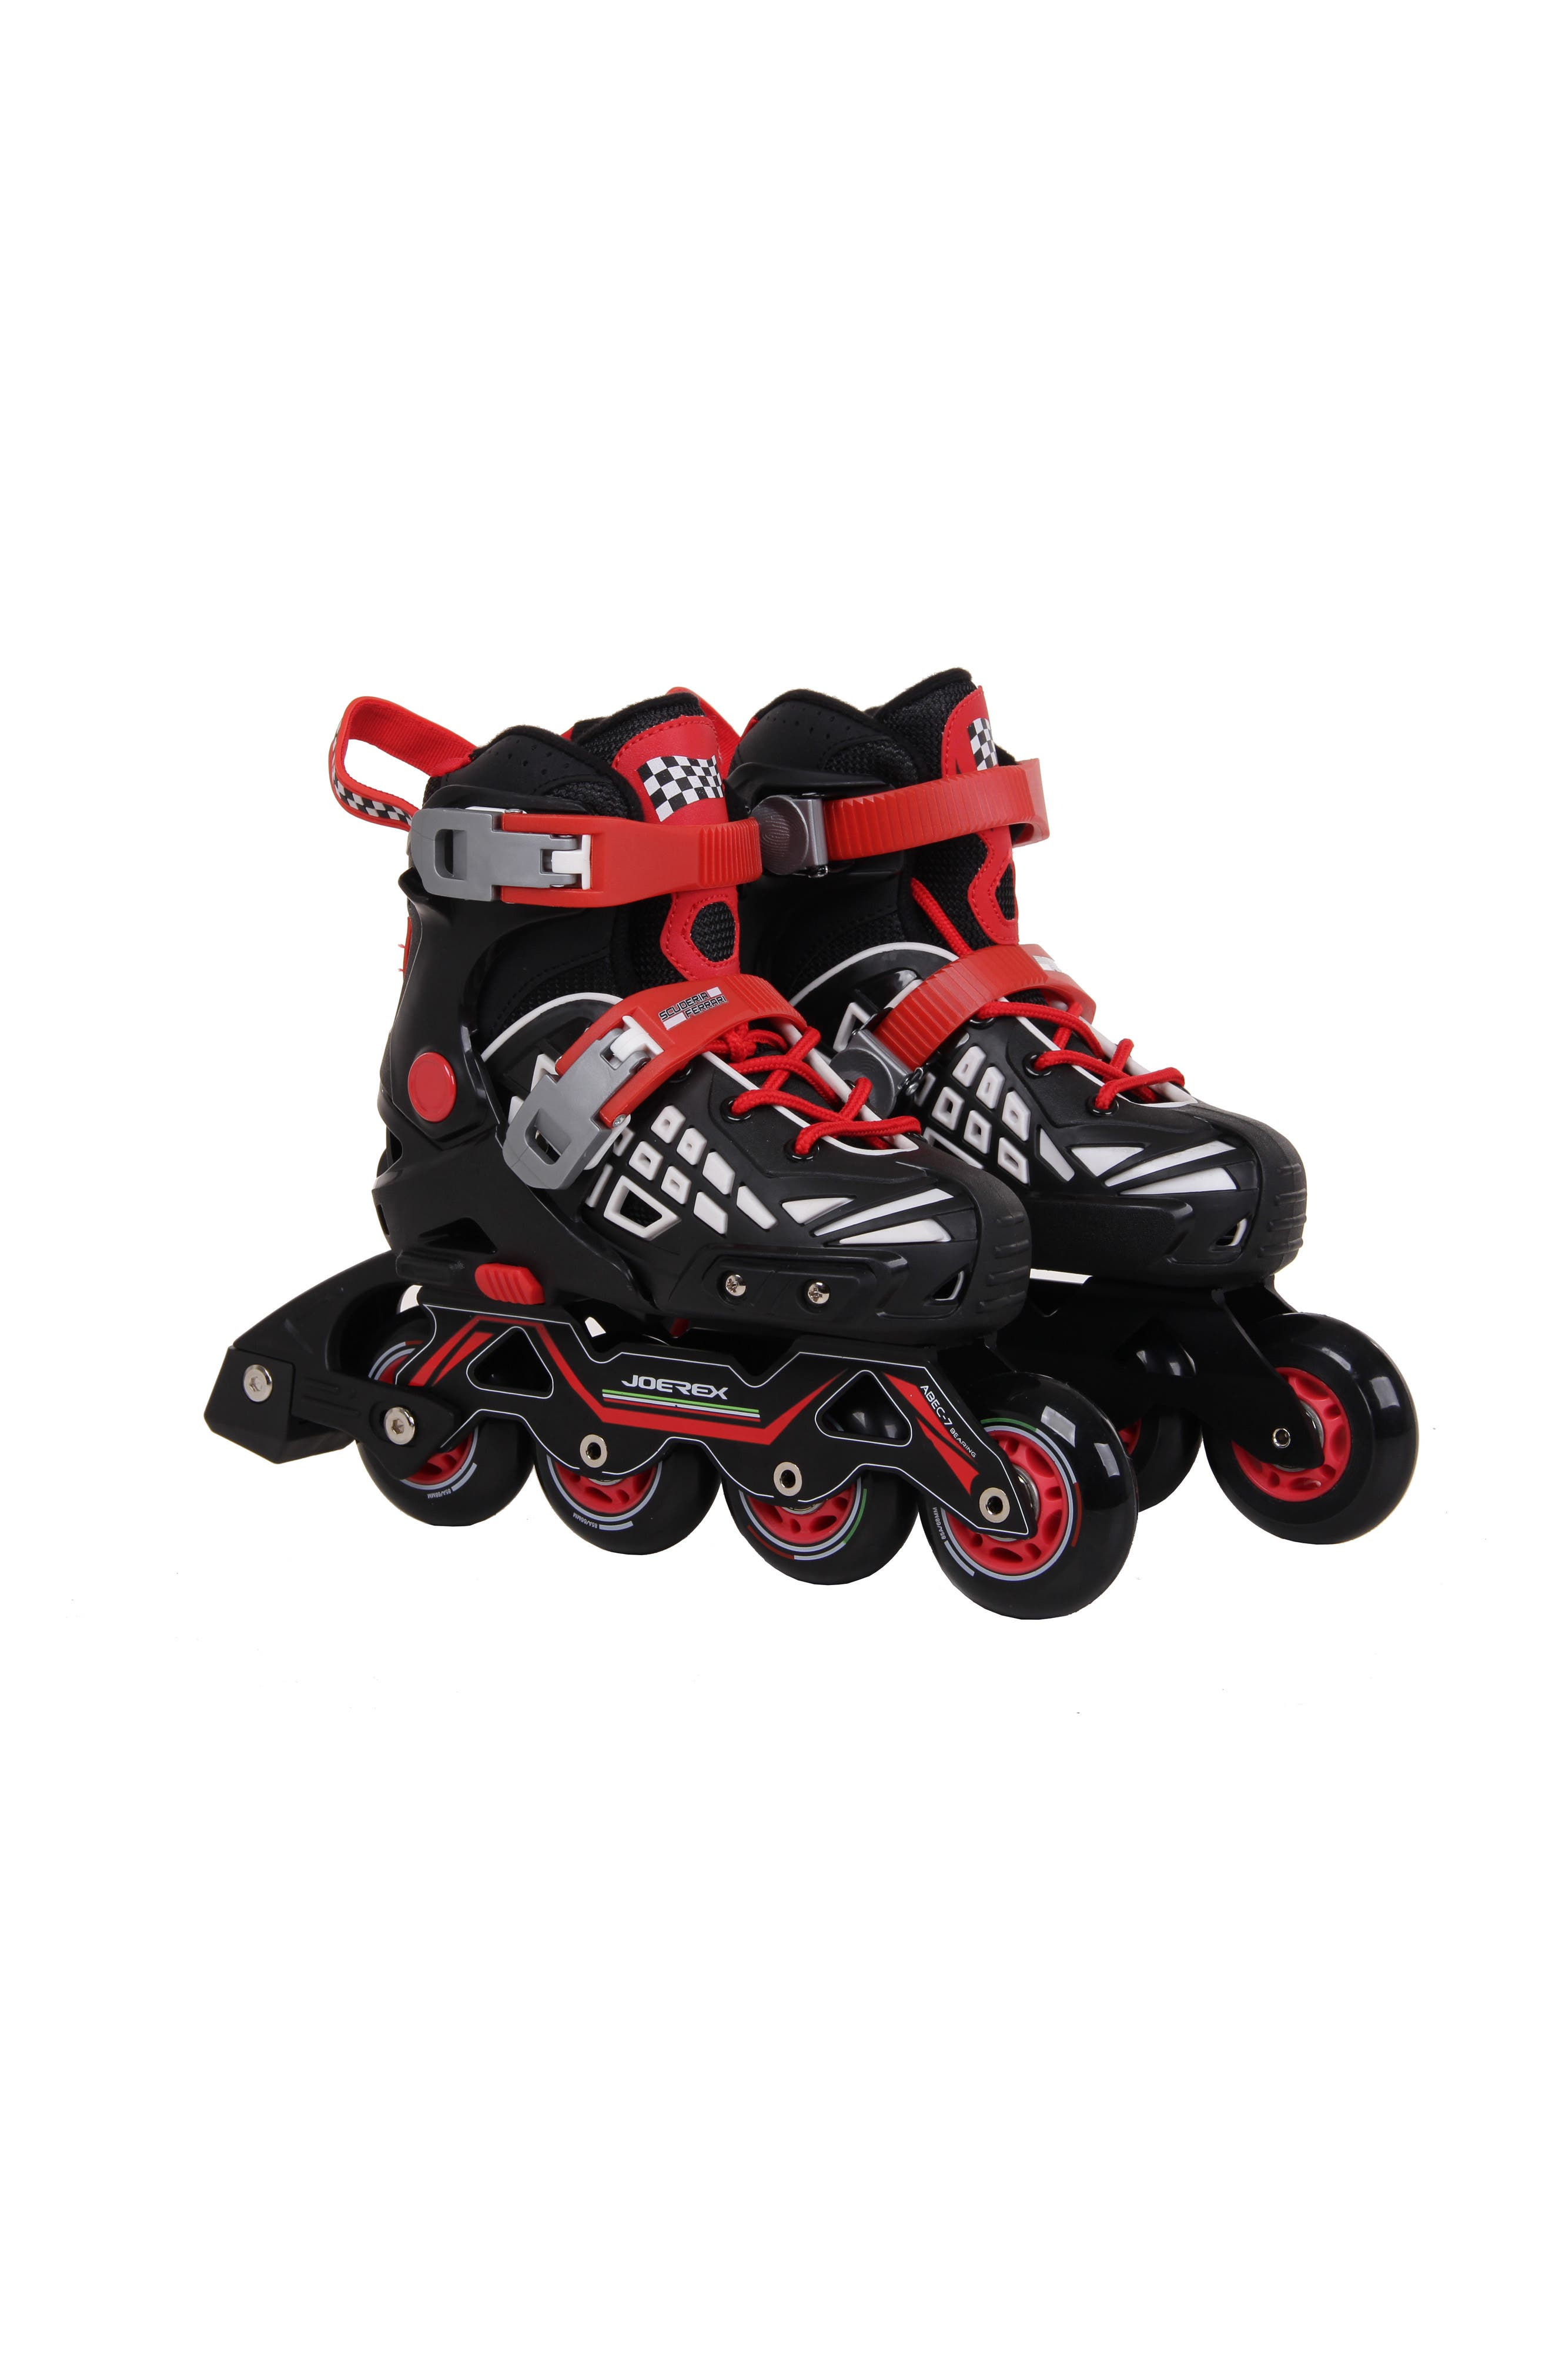 Slalom Inline Skates,                             Main thumbnail 1, color,                             001